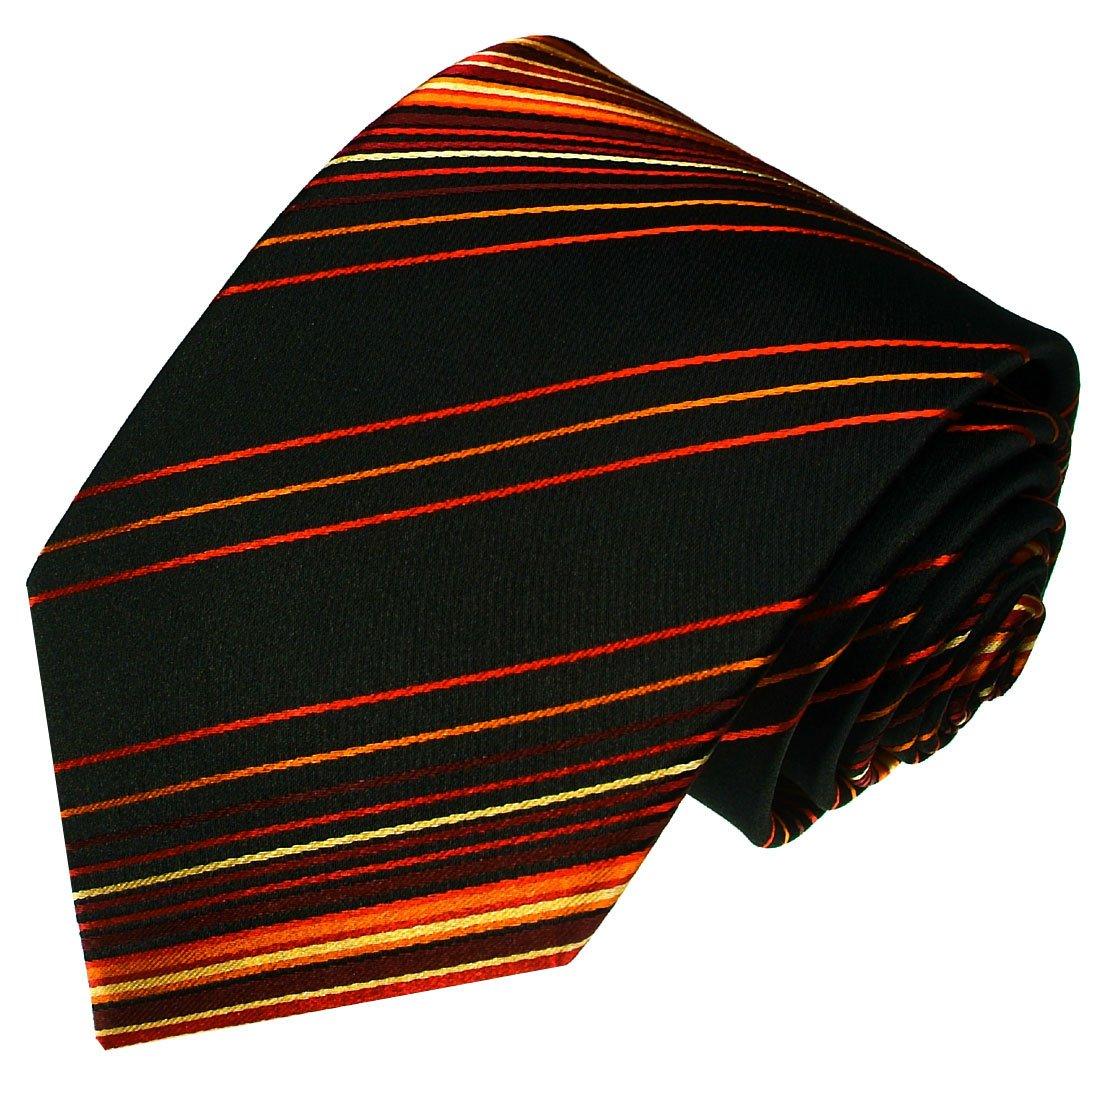 LORENZO CANA - exclusiva seda corbata - Naranja Negro Rojo Rayas ...